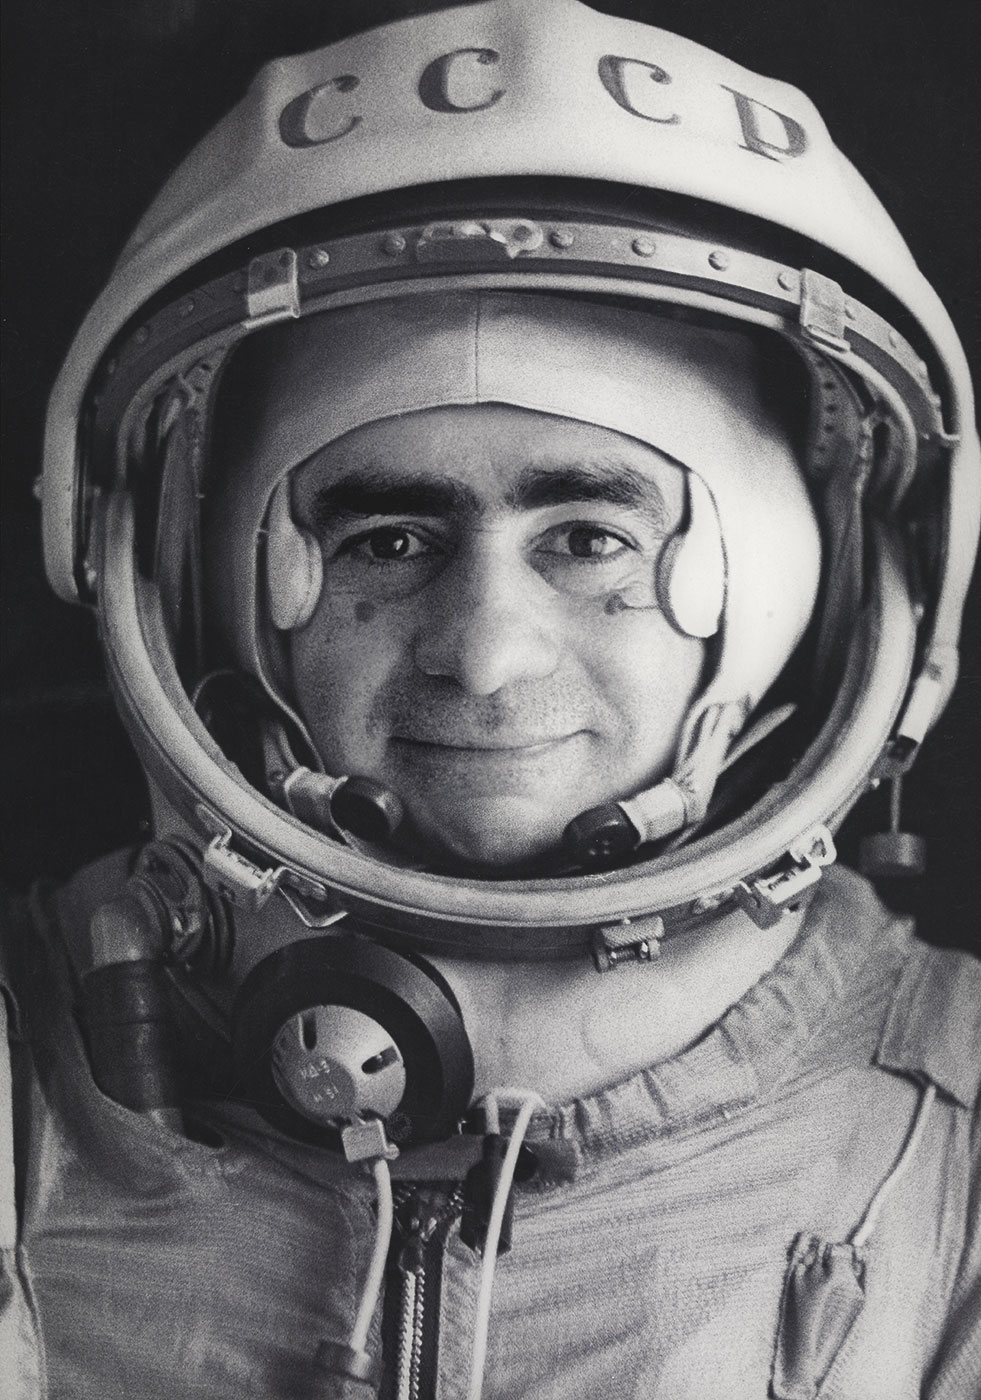 Joan Fontcuberta. Retrato oficial del cosmonauta Ivan Istochnikov, 1997. ©Joan Fontcuberta, VEGAP, Madrid, 2016.